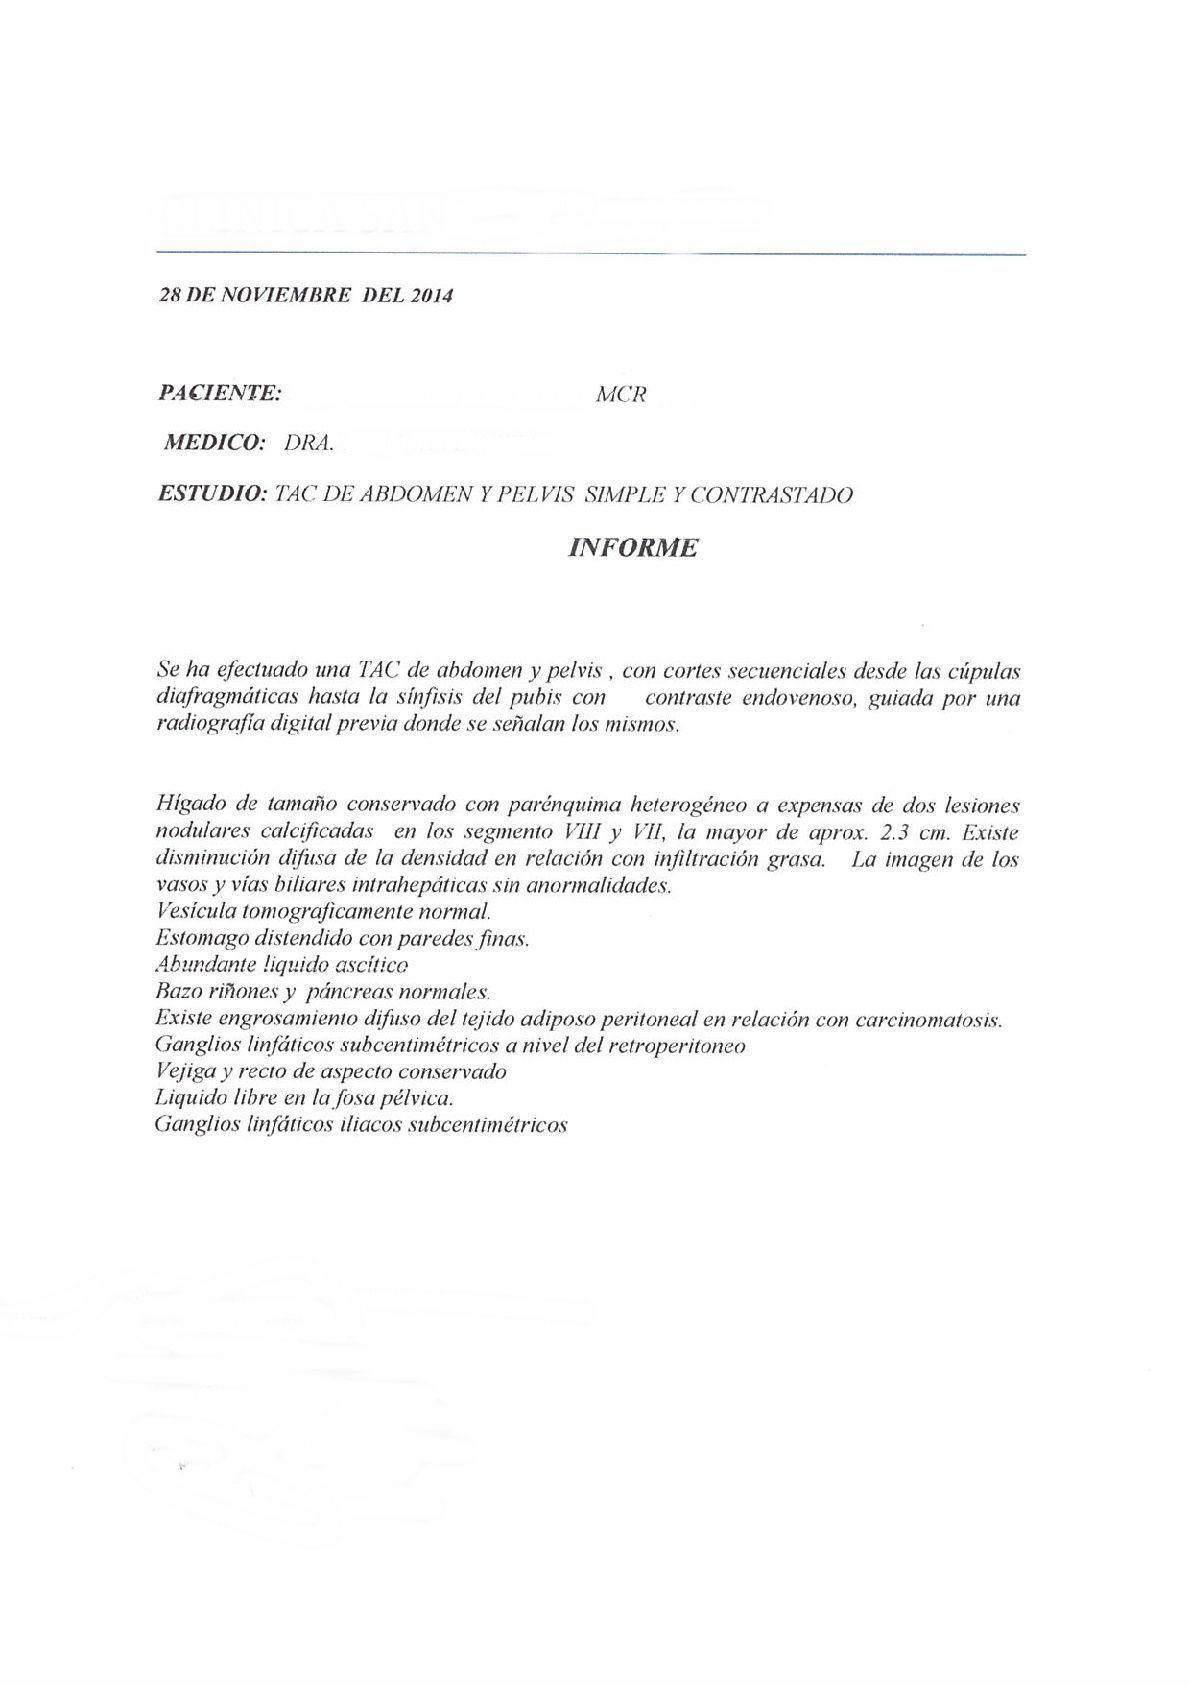 LifEscozul® - M.C.R. 5 - Cáncer de Ovarios